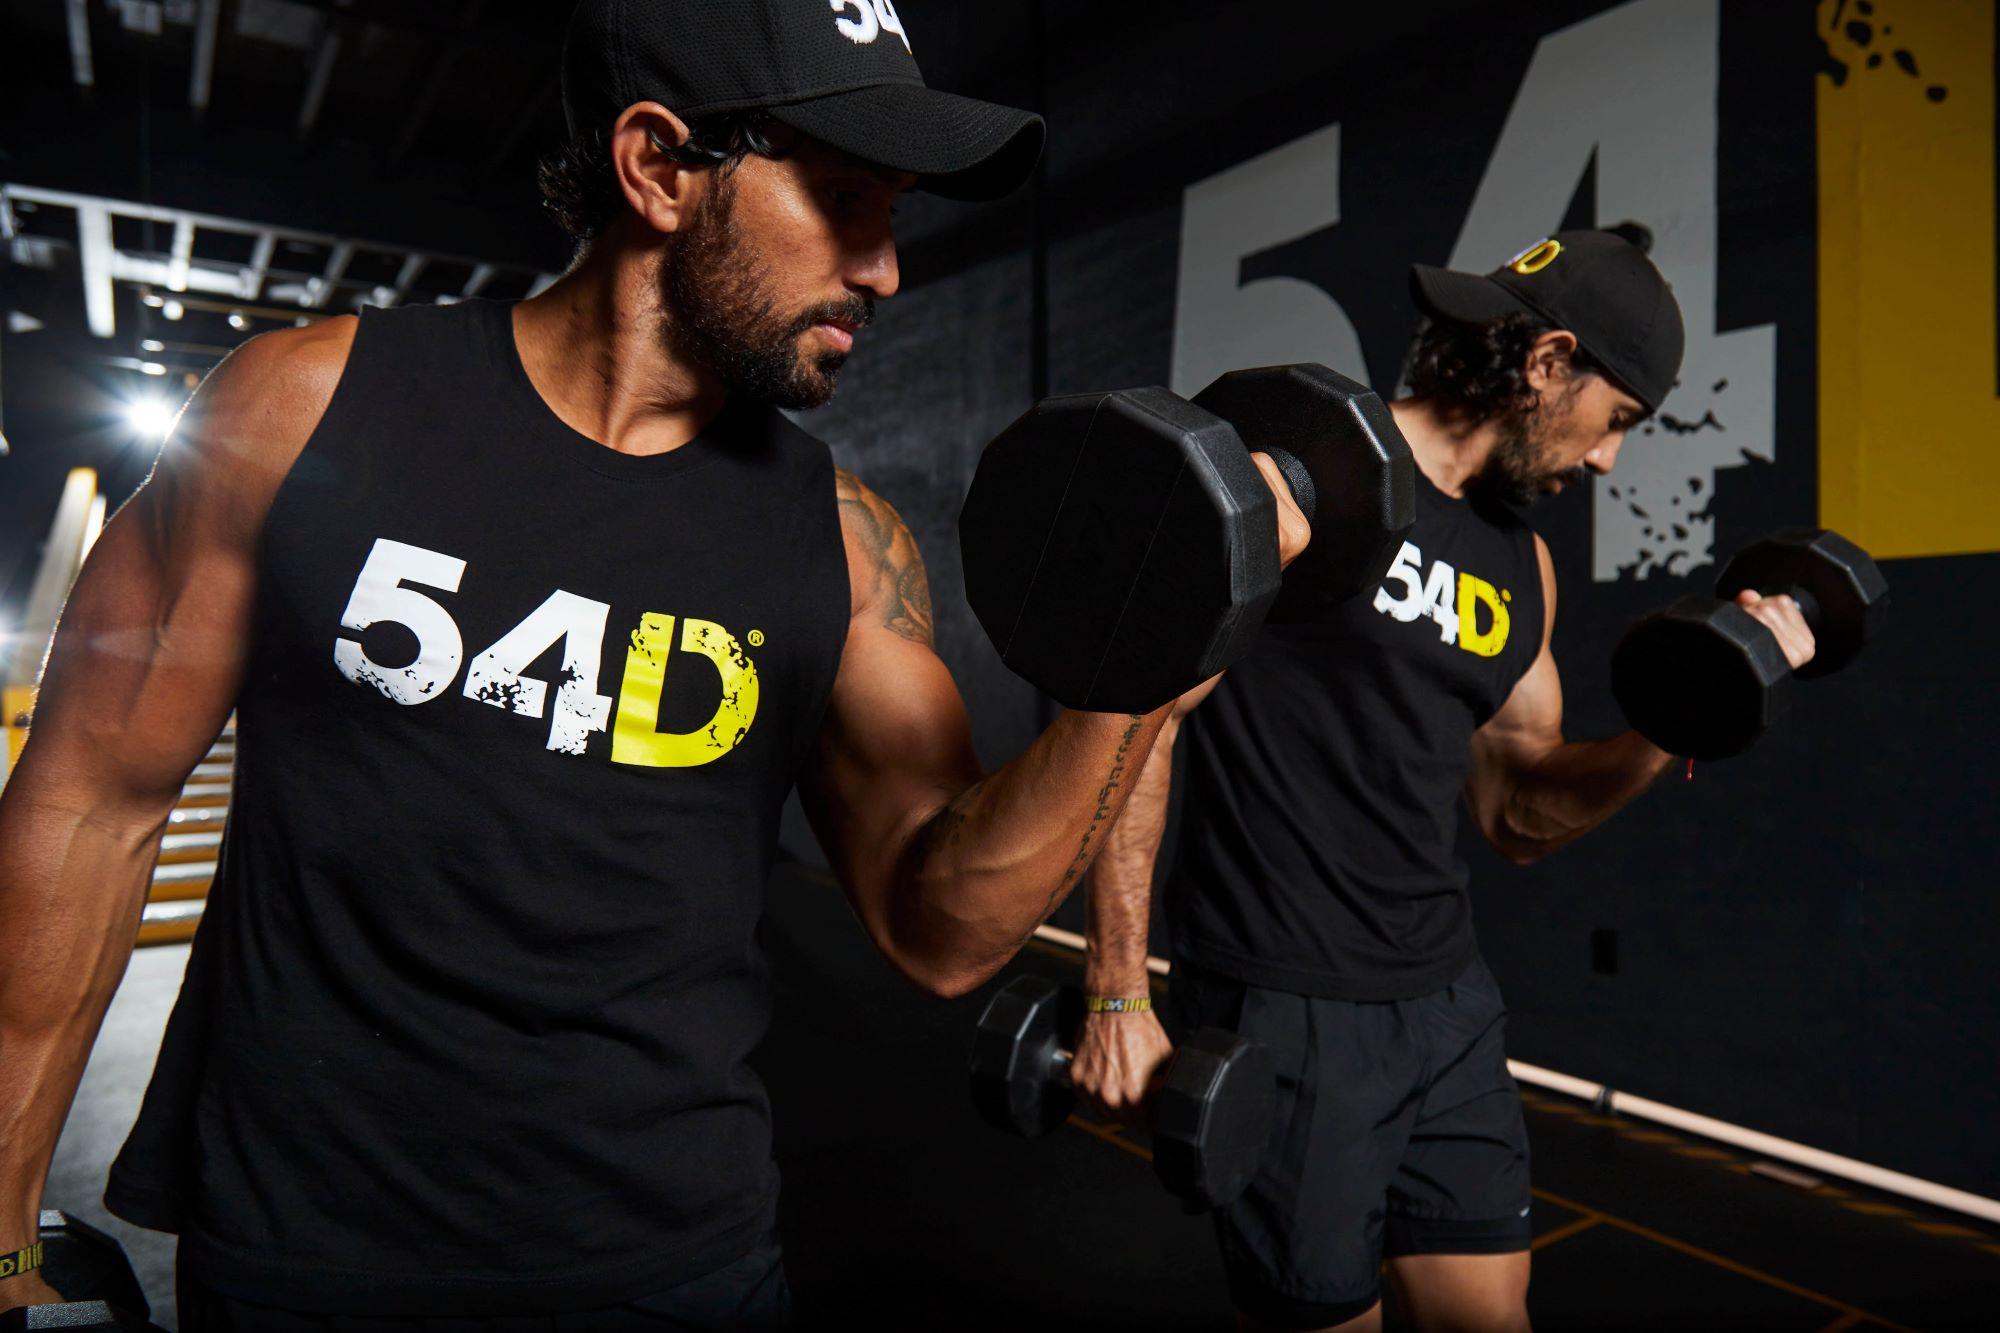 54D ON Digital Program